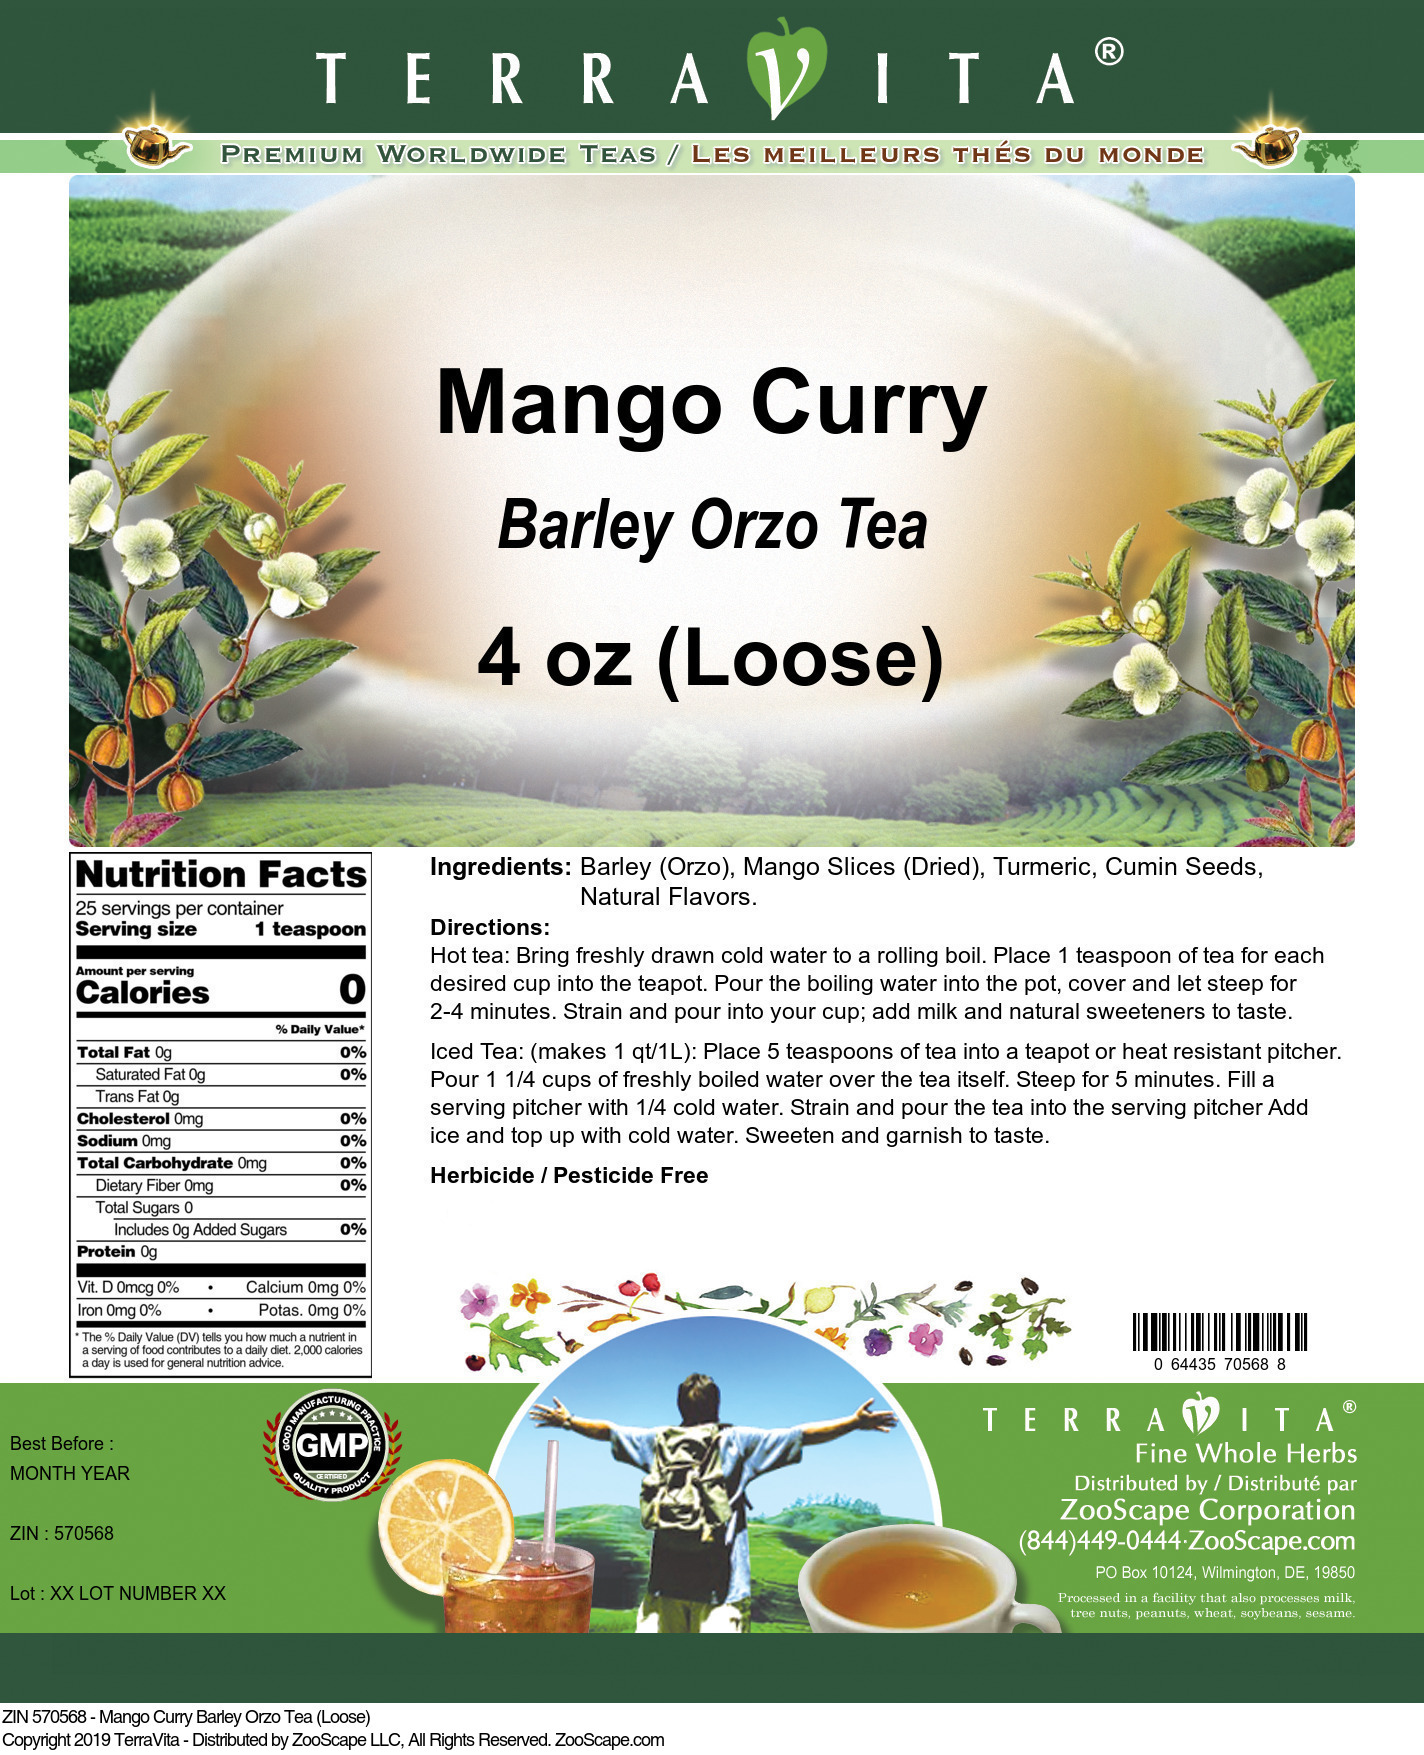 Mango Curry Barley Orzo Tea (Loose)